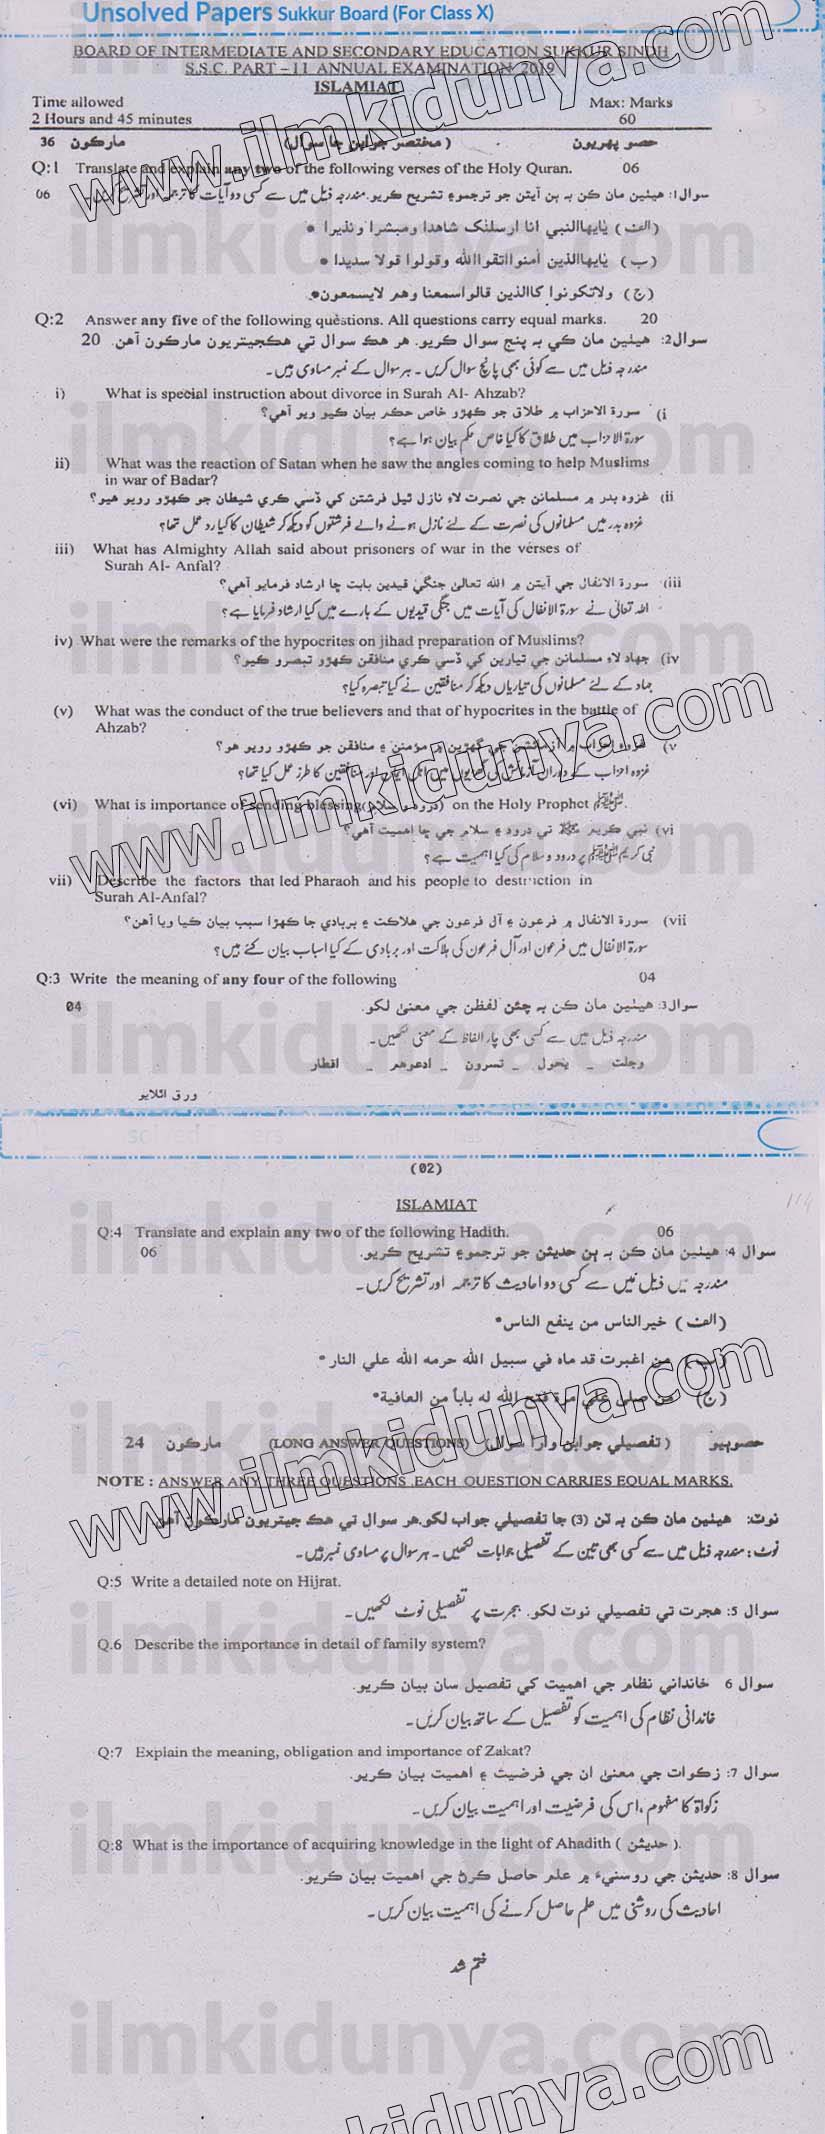 Past Paper 2019 Sukkur Board 10th Class Islamiyat